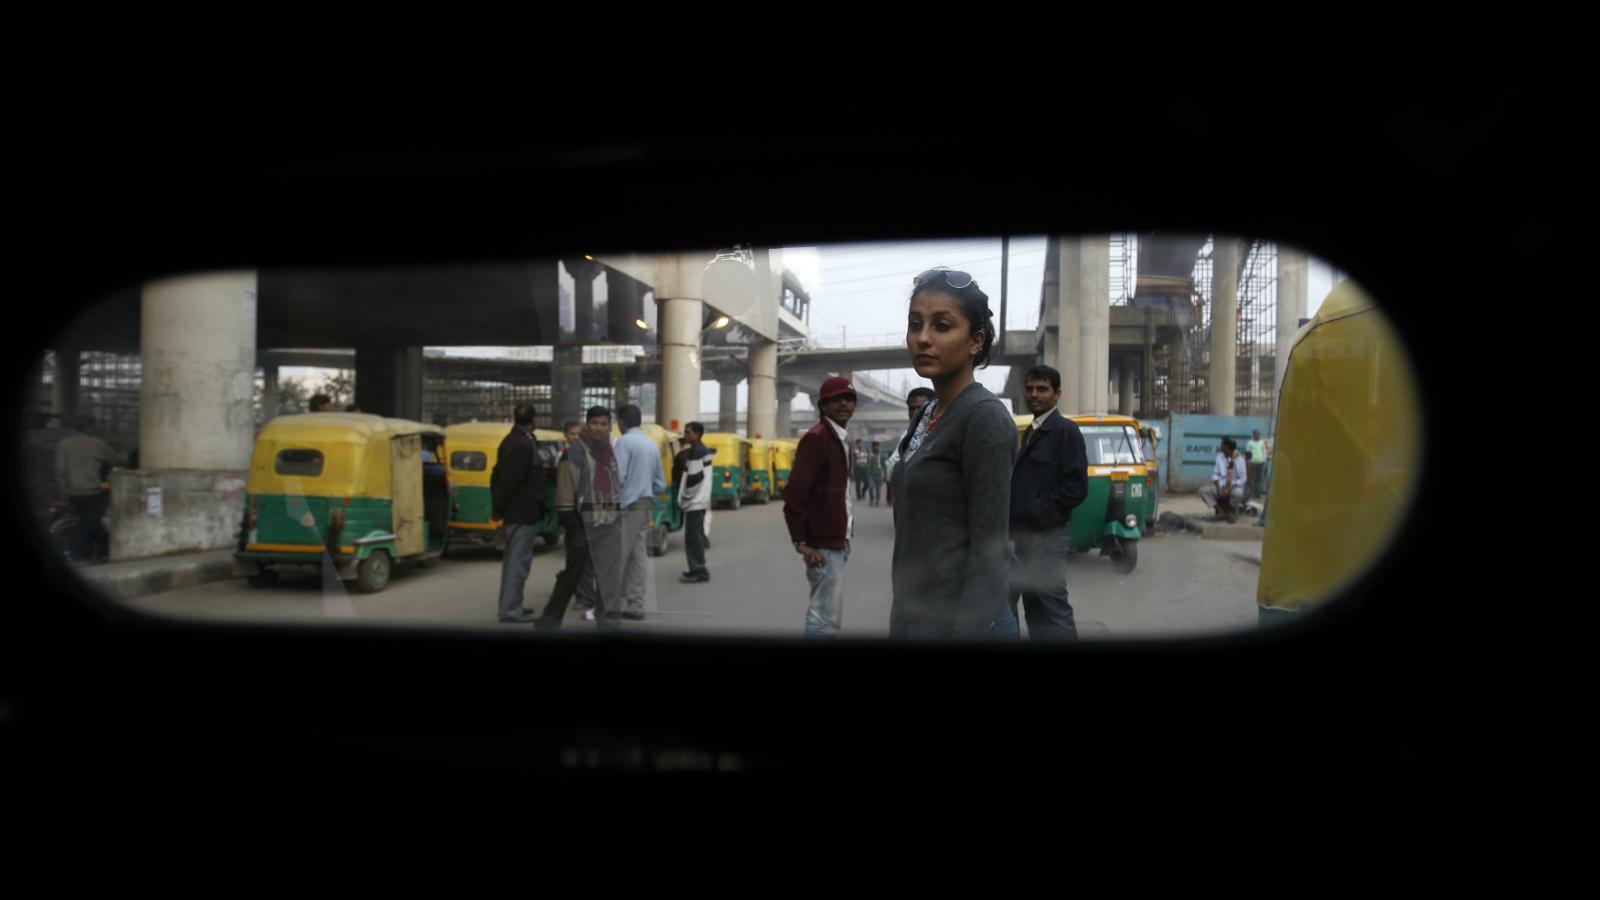 India-stalking-safety